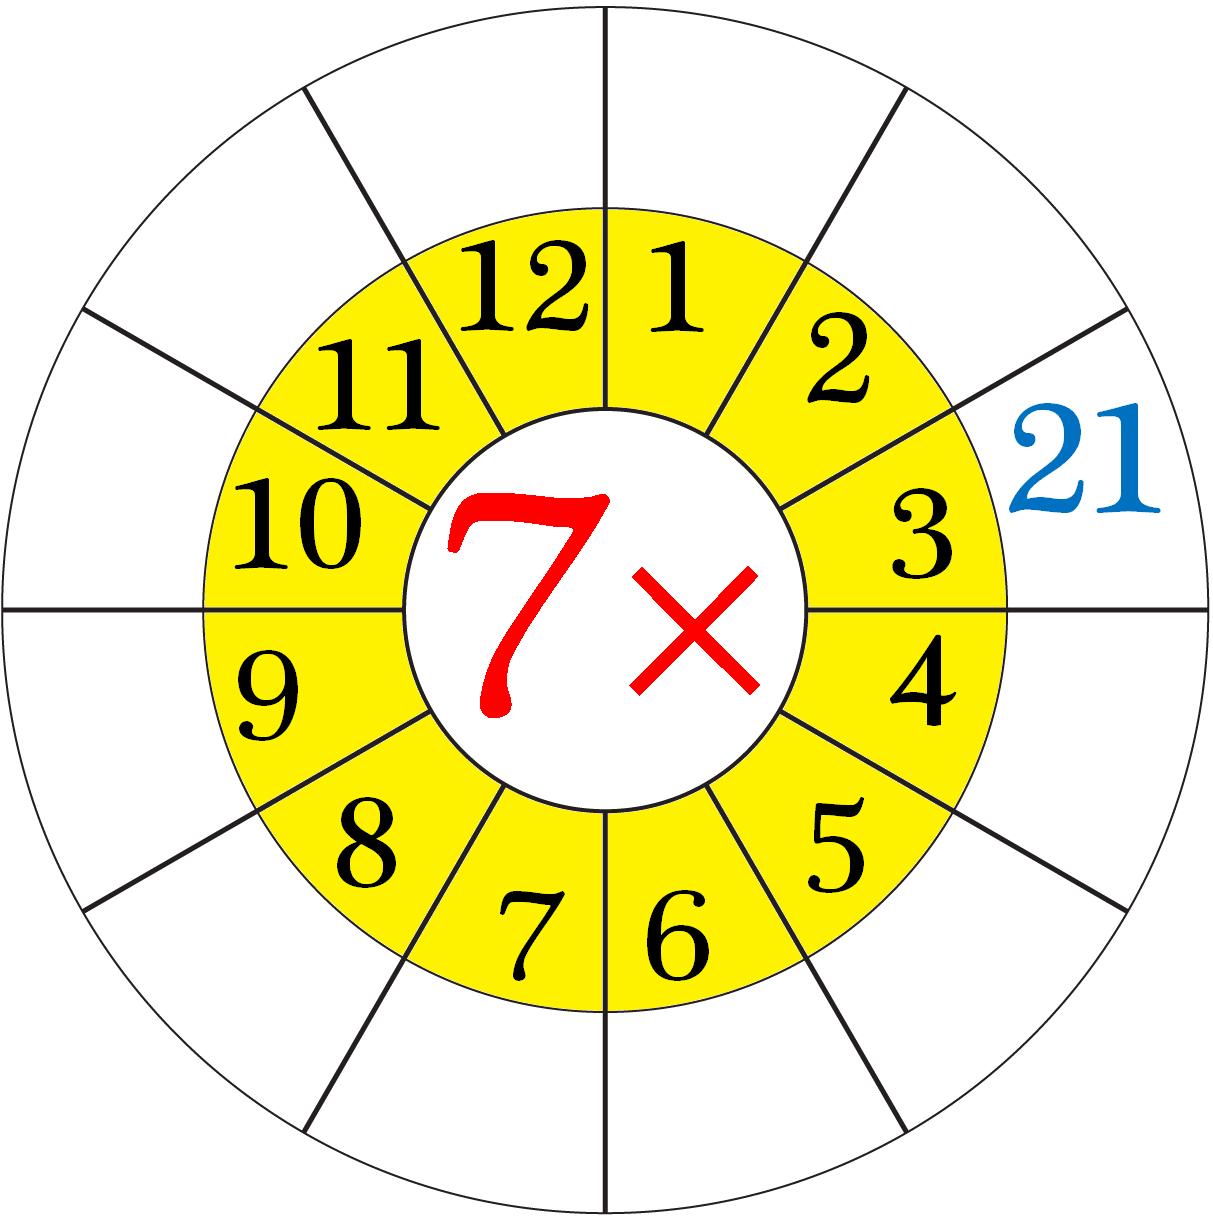 Worksheet On Multiplication Table Of 7 | Word Problems On 7 in Multiplication Worksheets 7 Tables